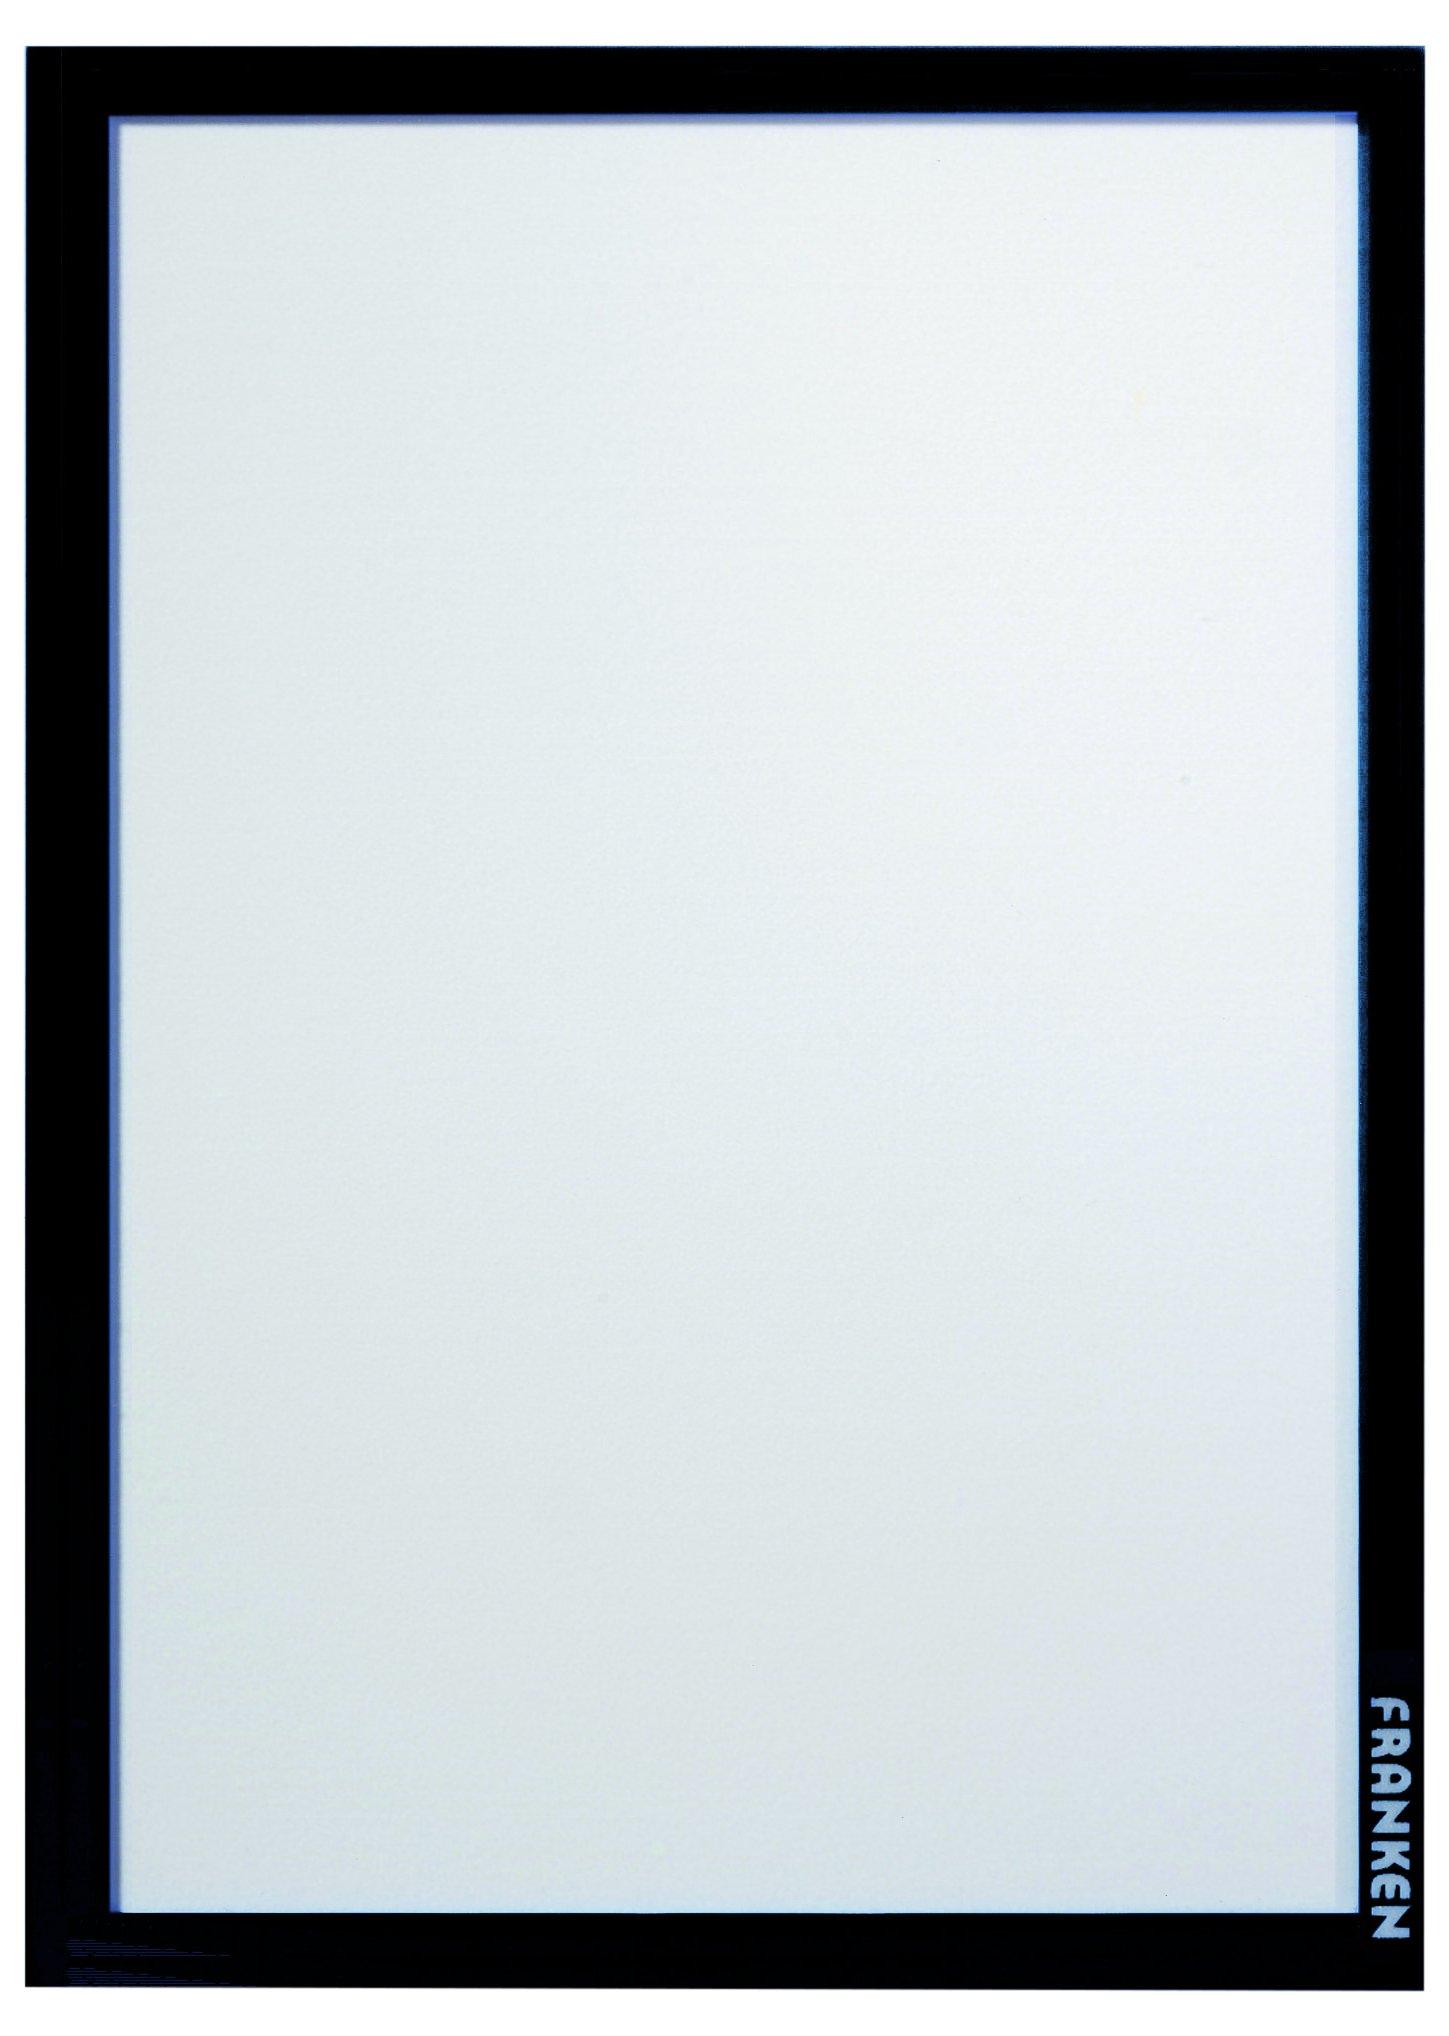 Franc AR14102 Window Display Frame It Pro, DIN A4, Hard Slide, Strength: 1.82 mm, Matt, Black